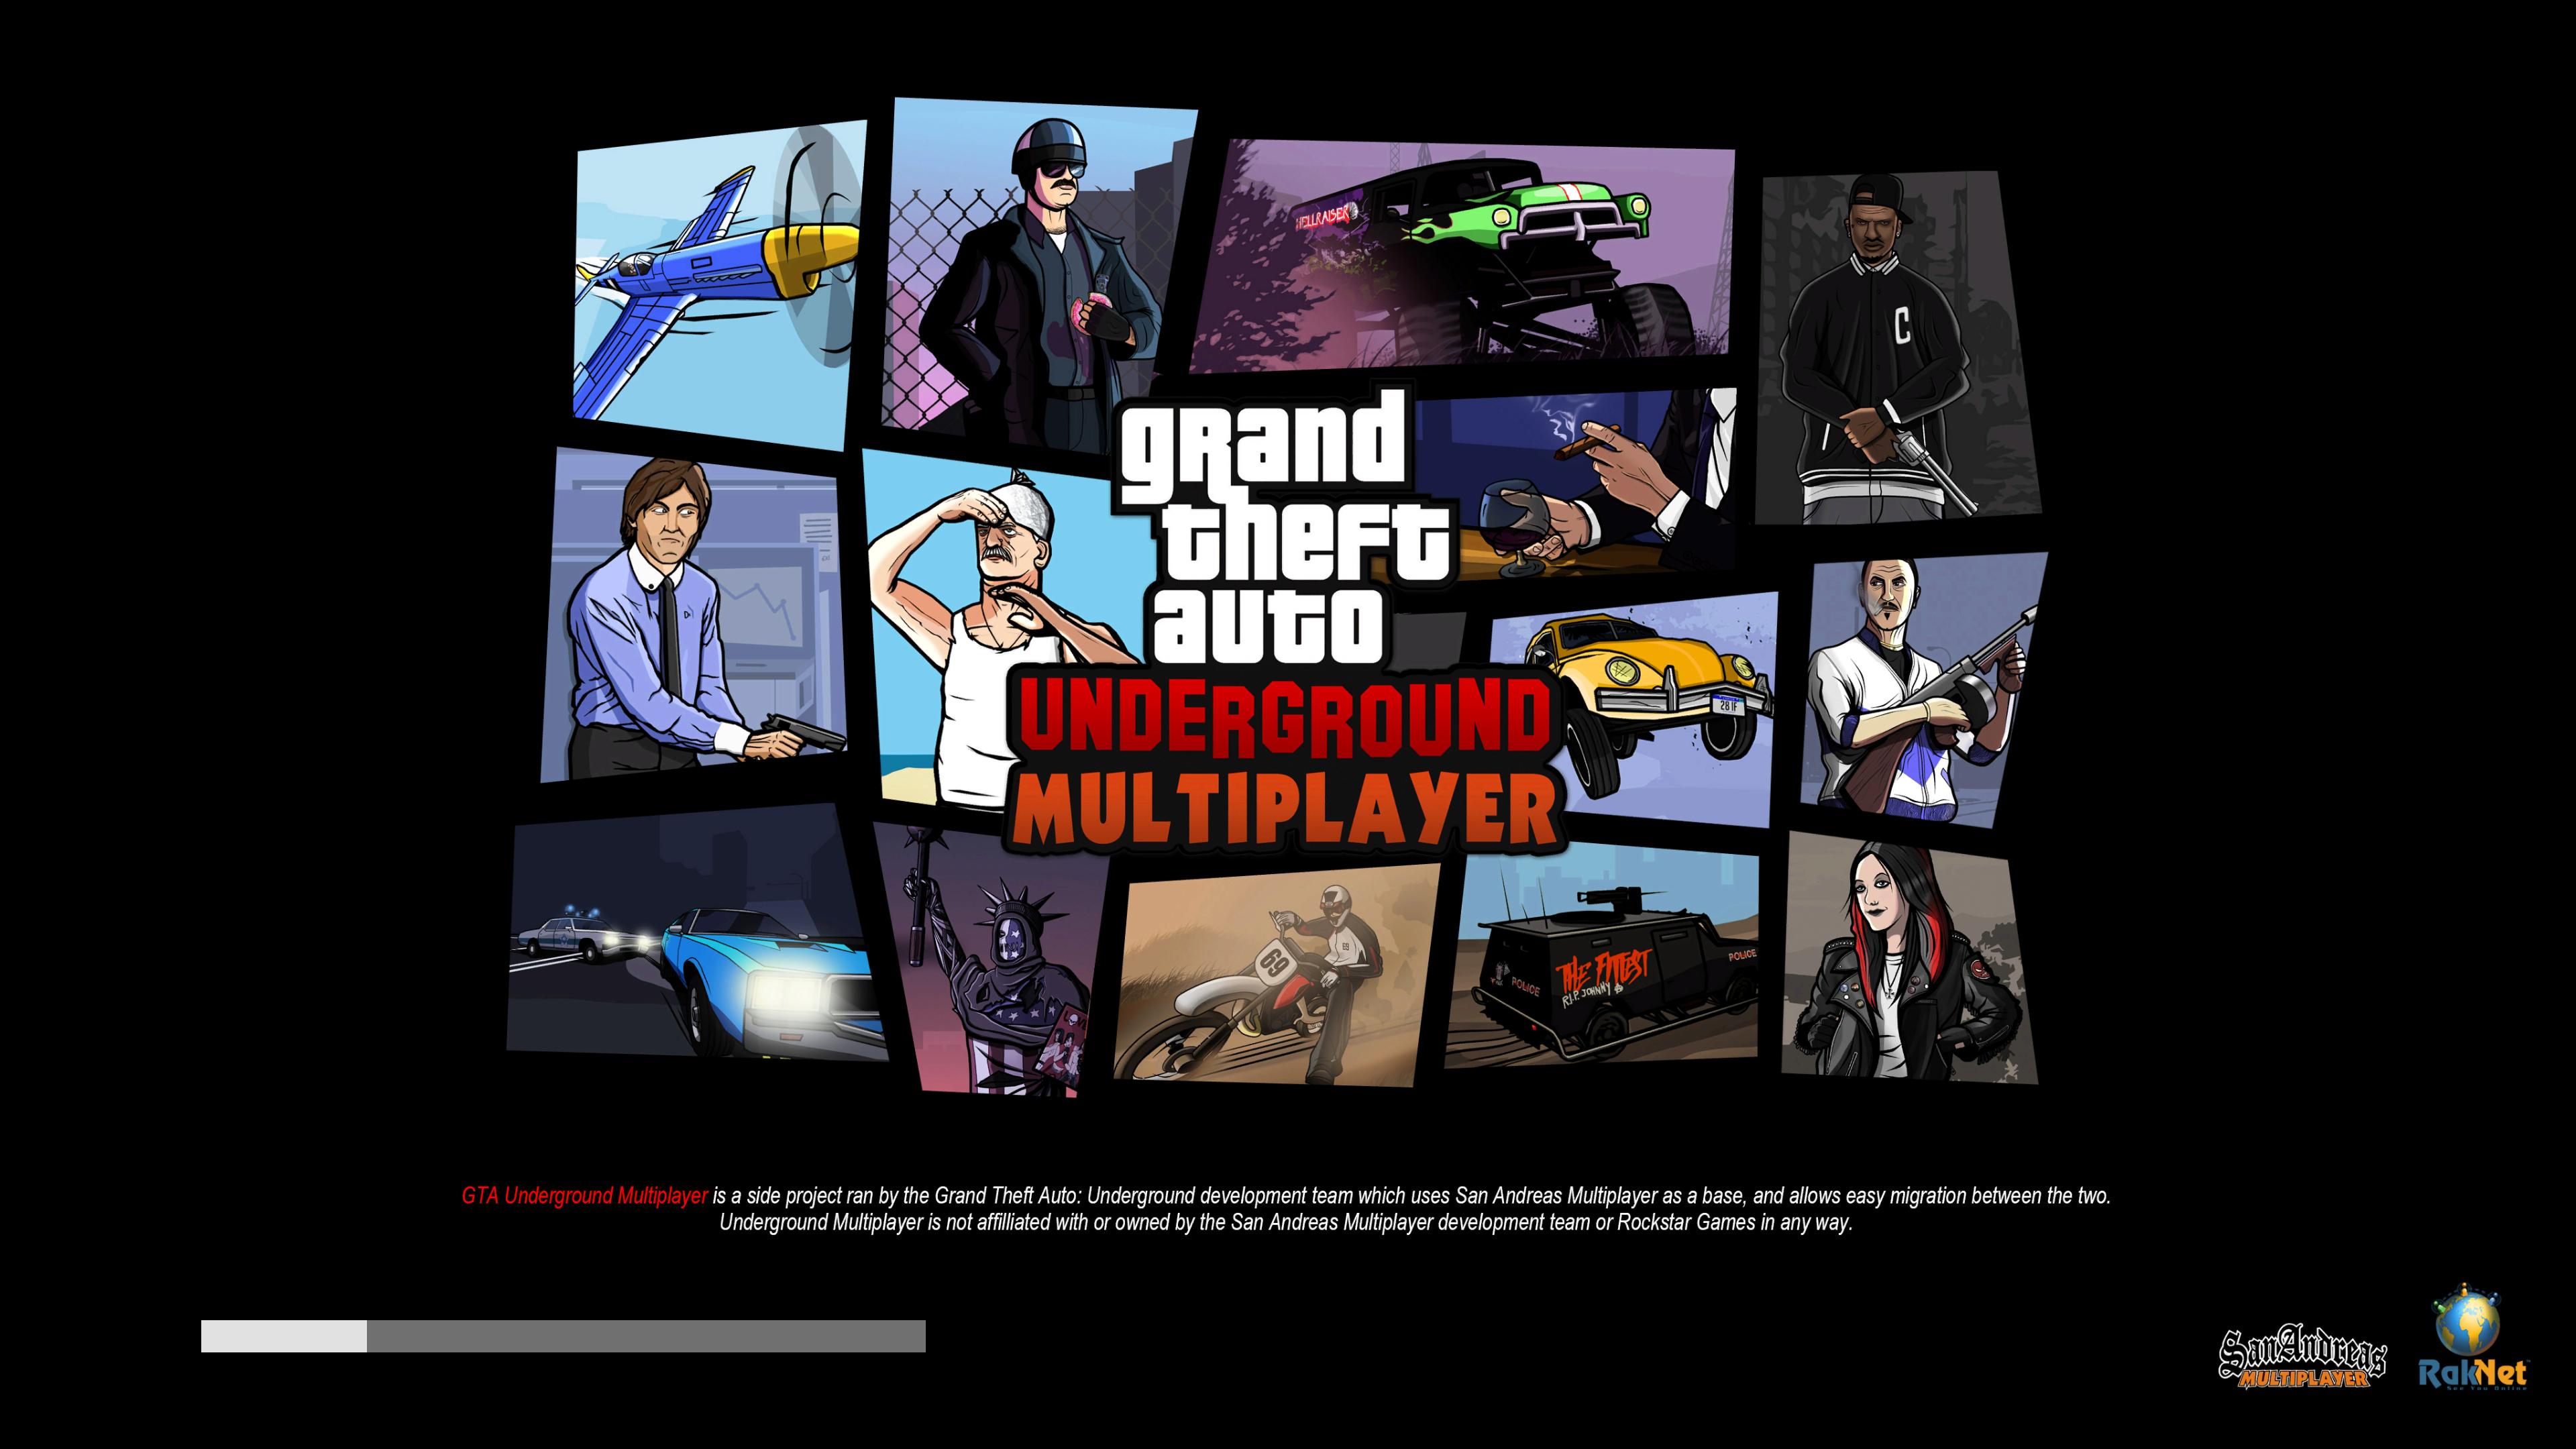 Grand_Theft_Auto_San_Andreas_Screenshot_2019.png